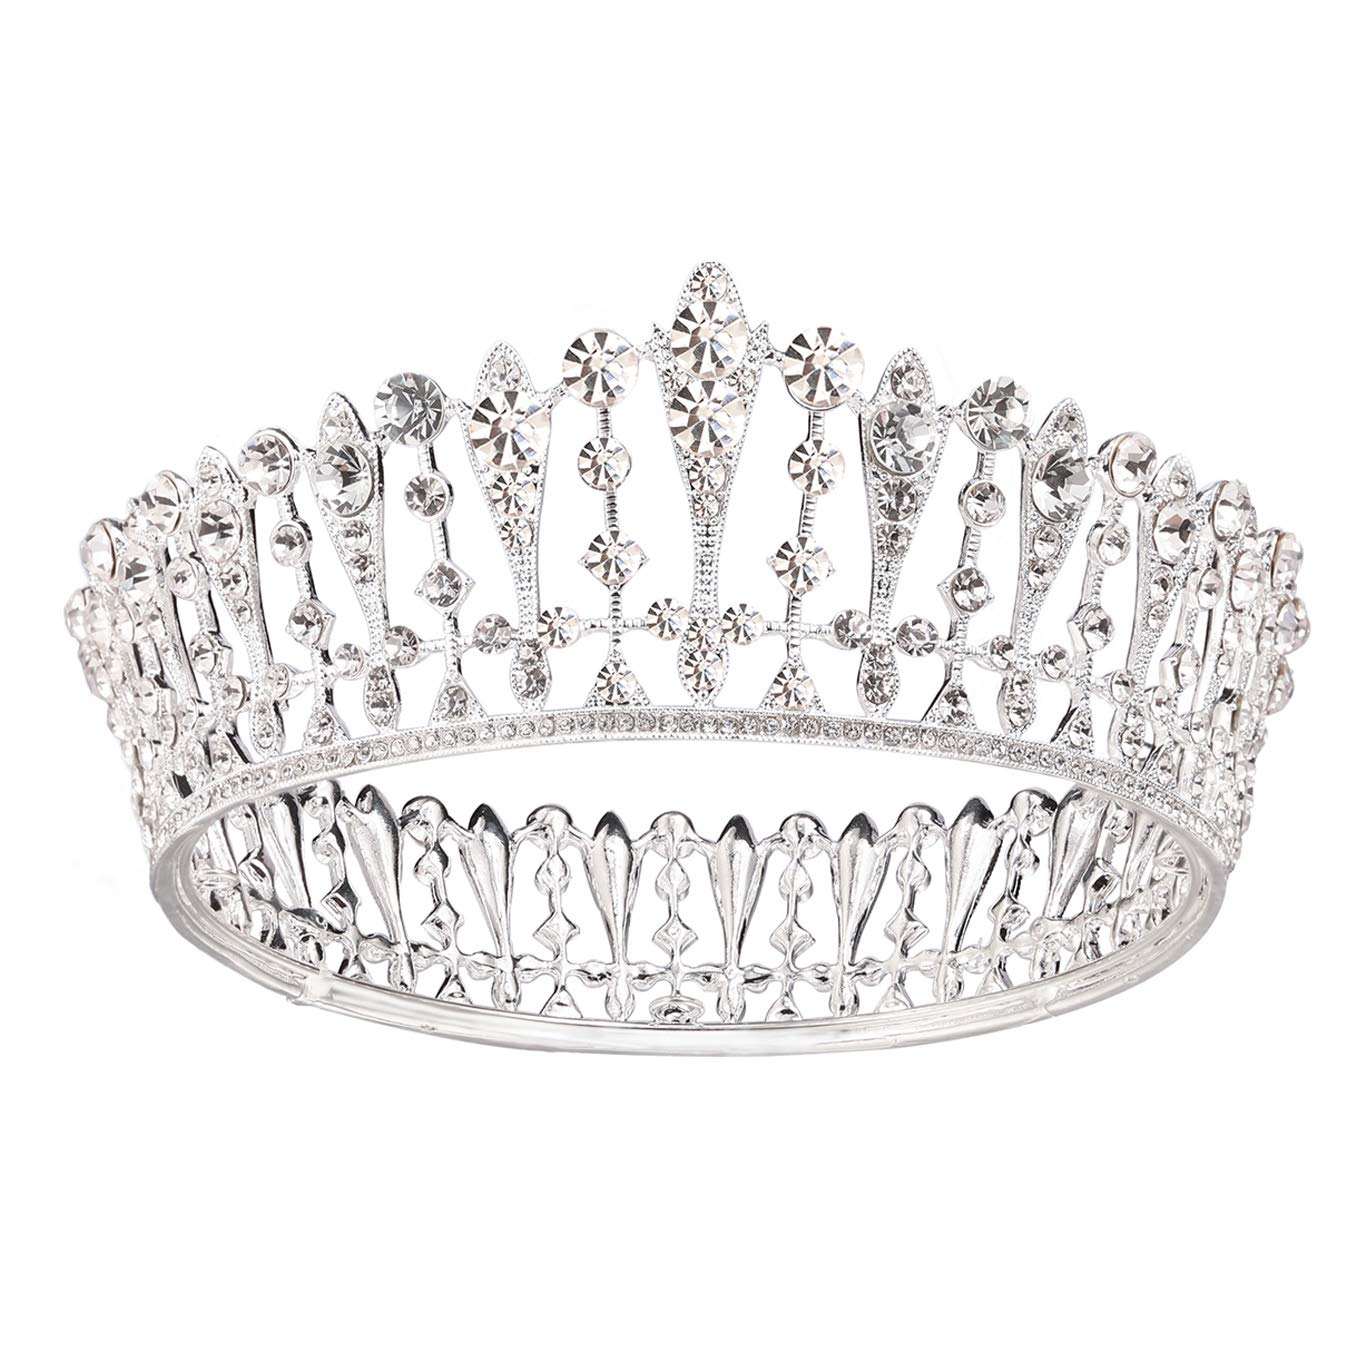 Bridal shower anniversary,events,best for thin hair Babyshower Wedding,Birthday Hair Accessories Tiara for Bride